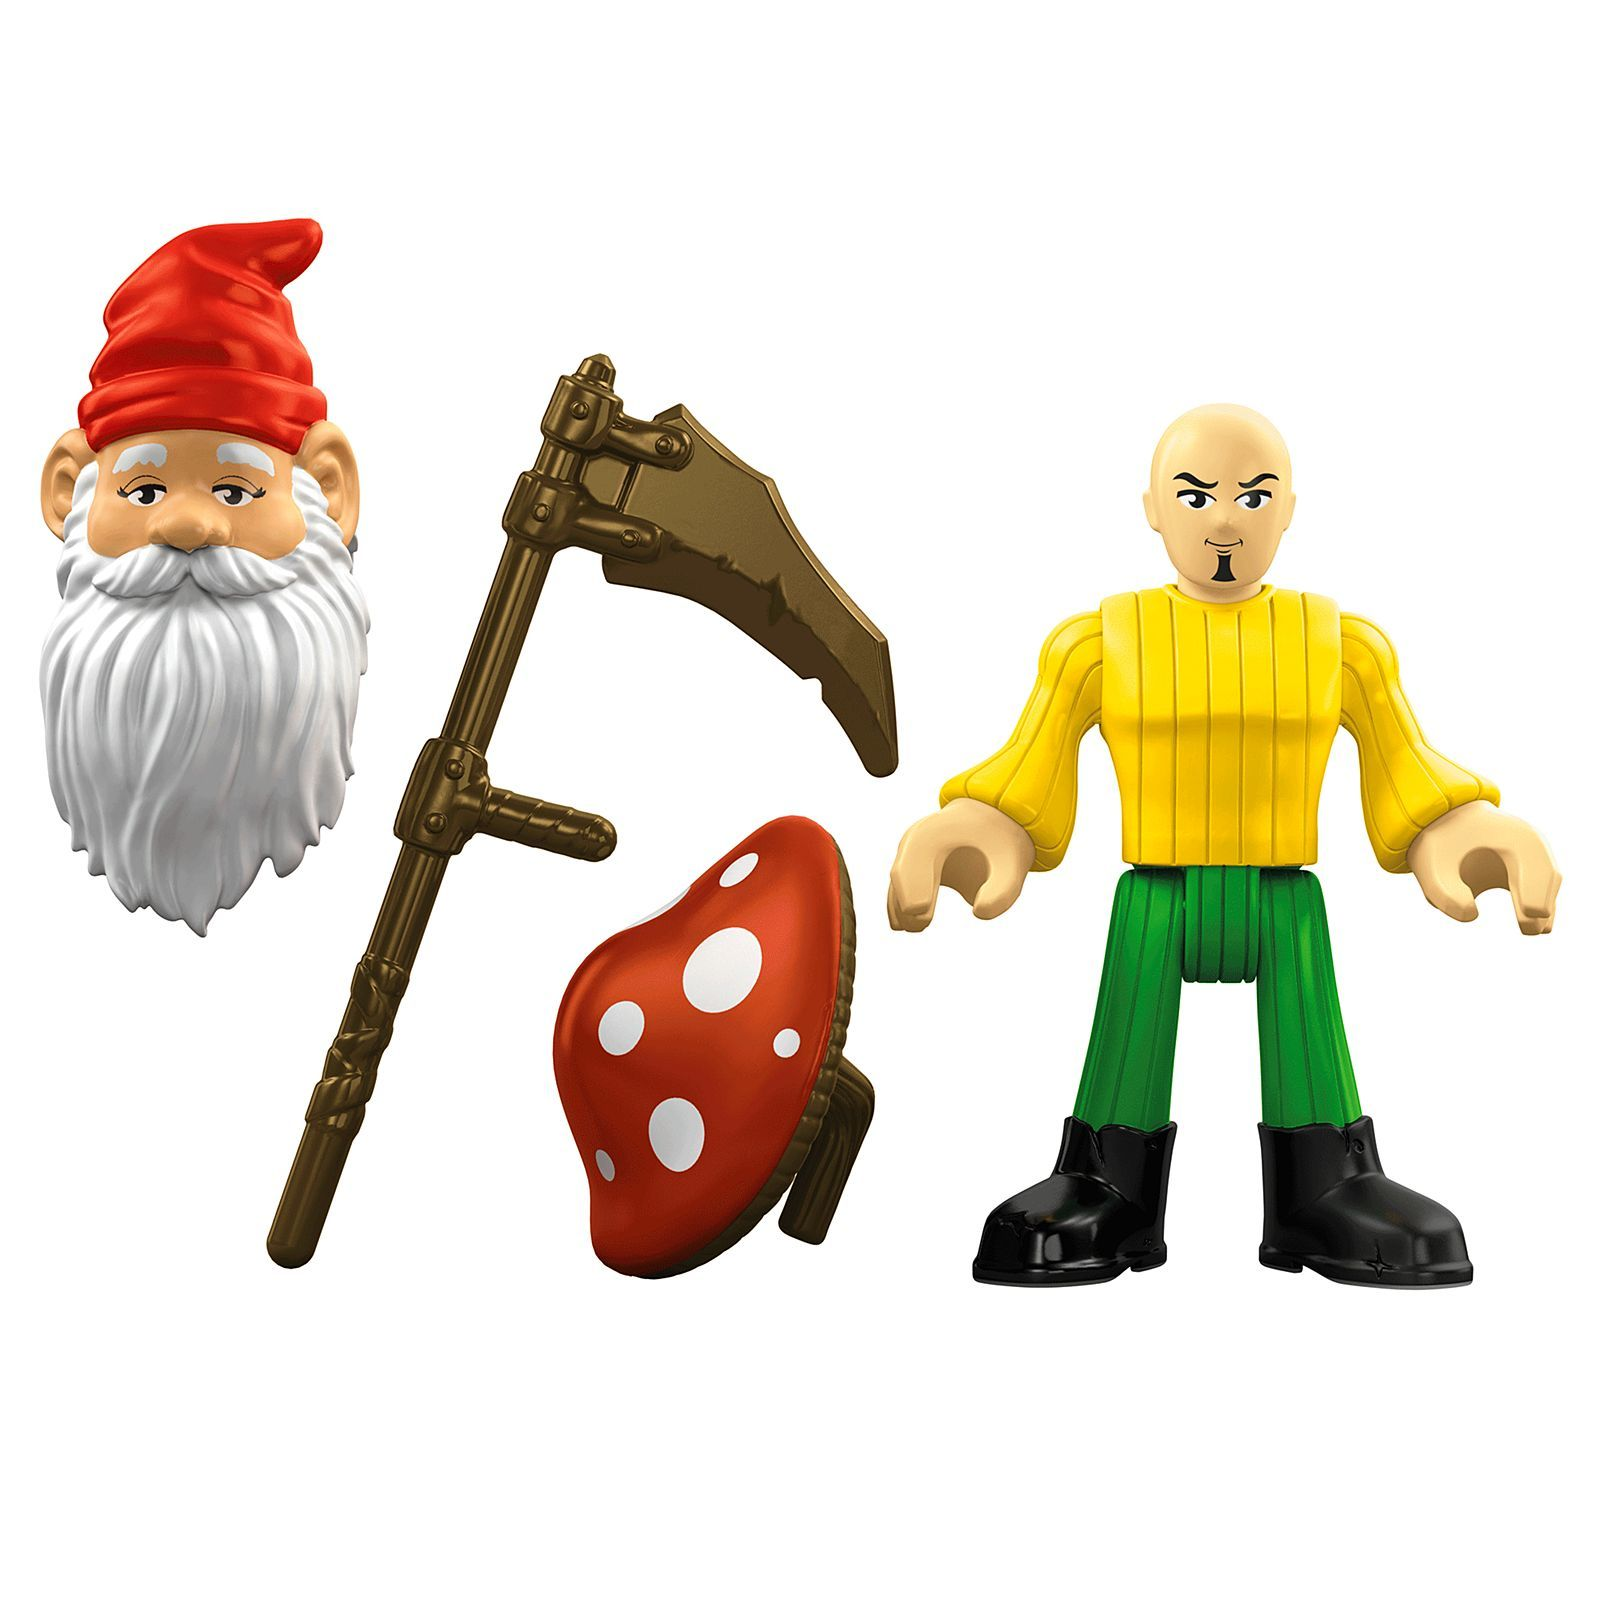 Imaginext gnome mattel kids toys playset action